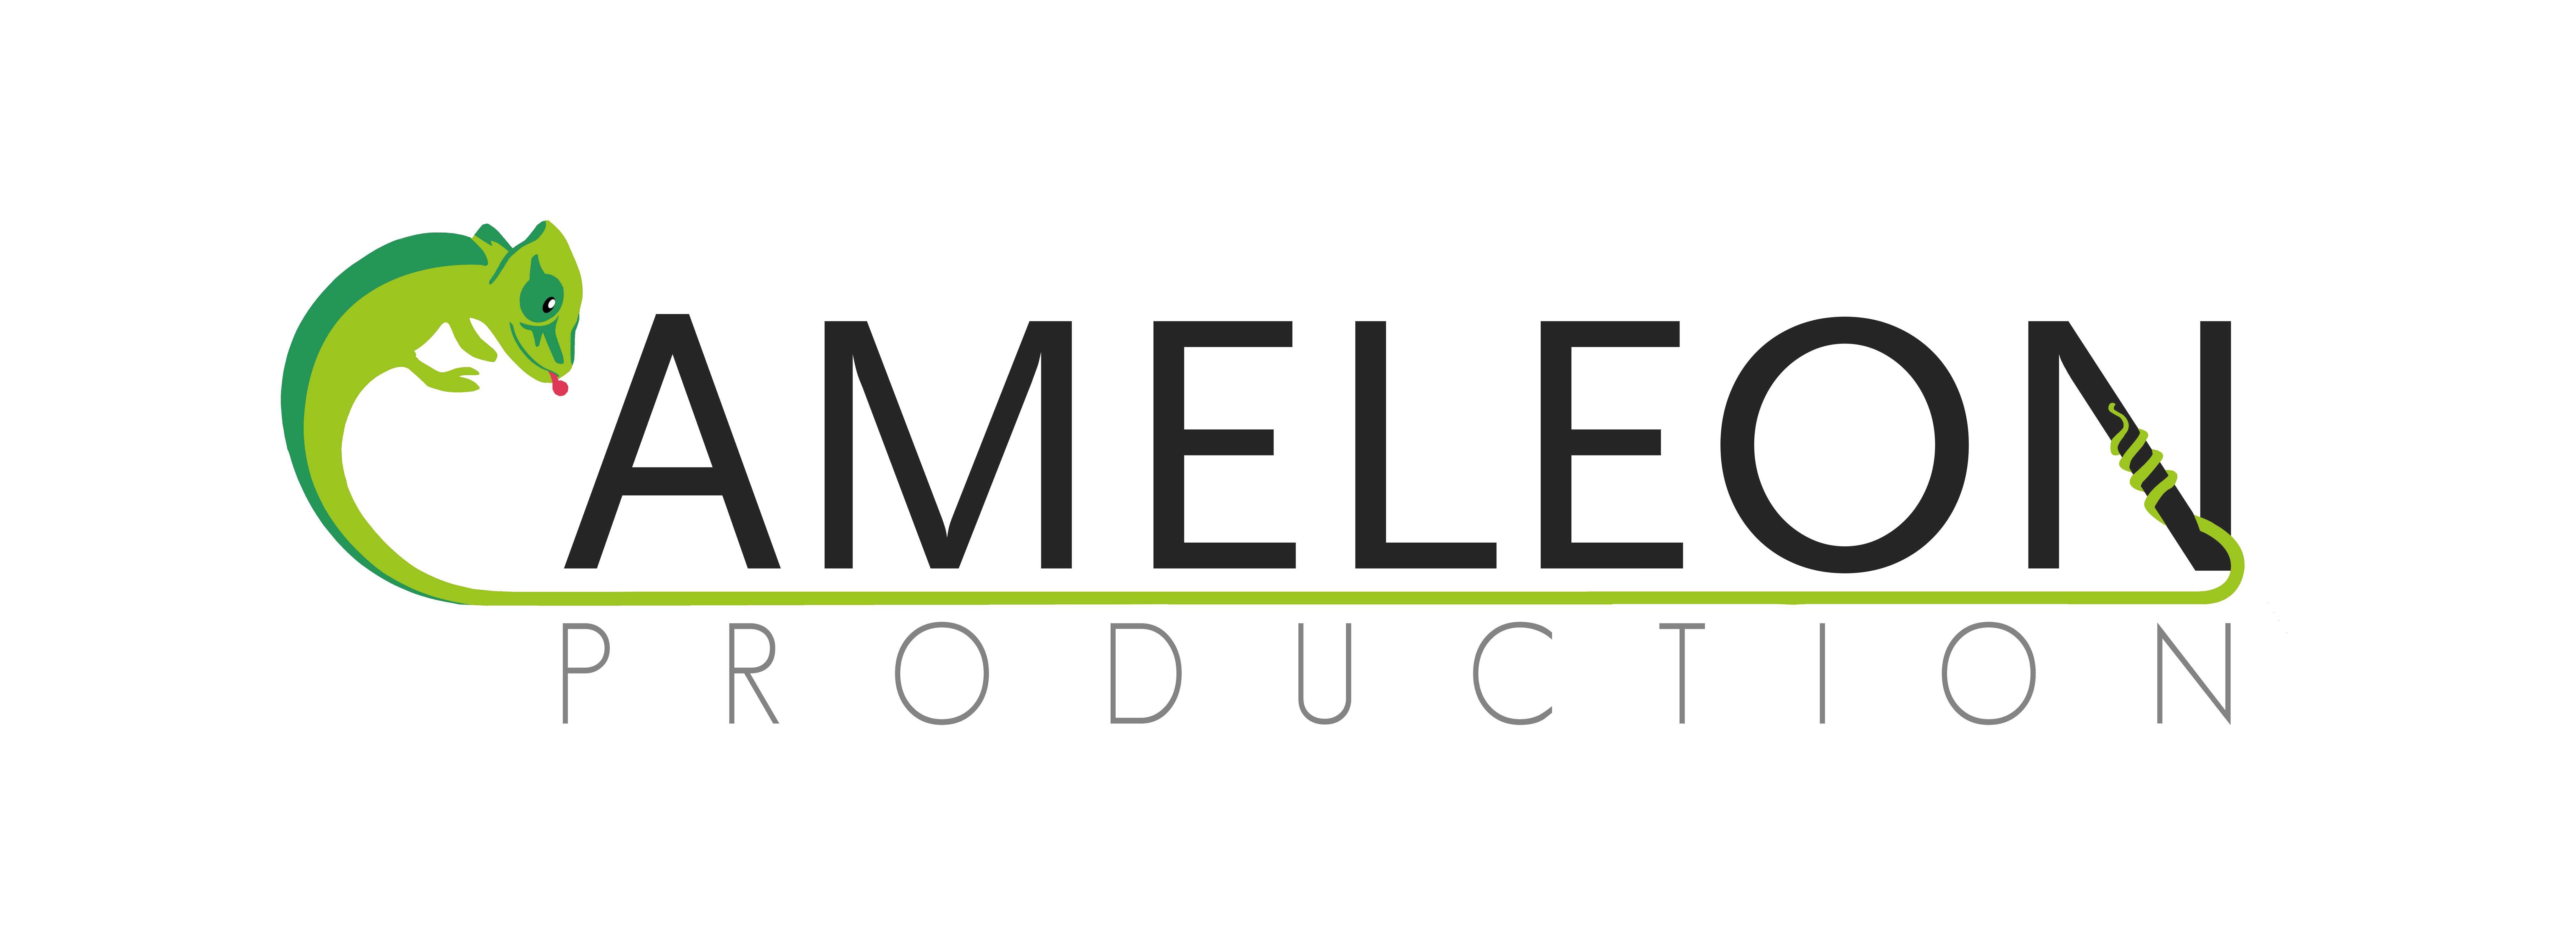 (c) Cameleon-prod.com